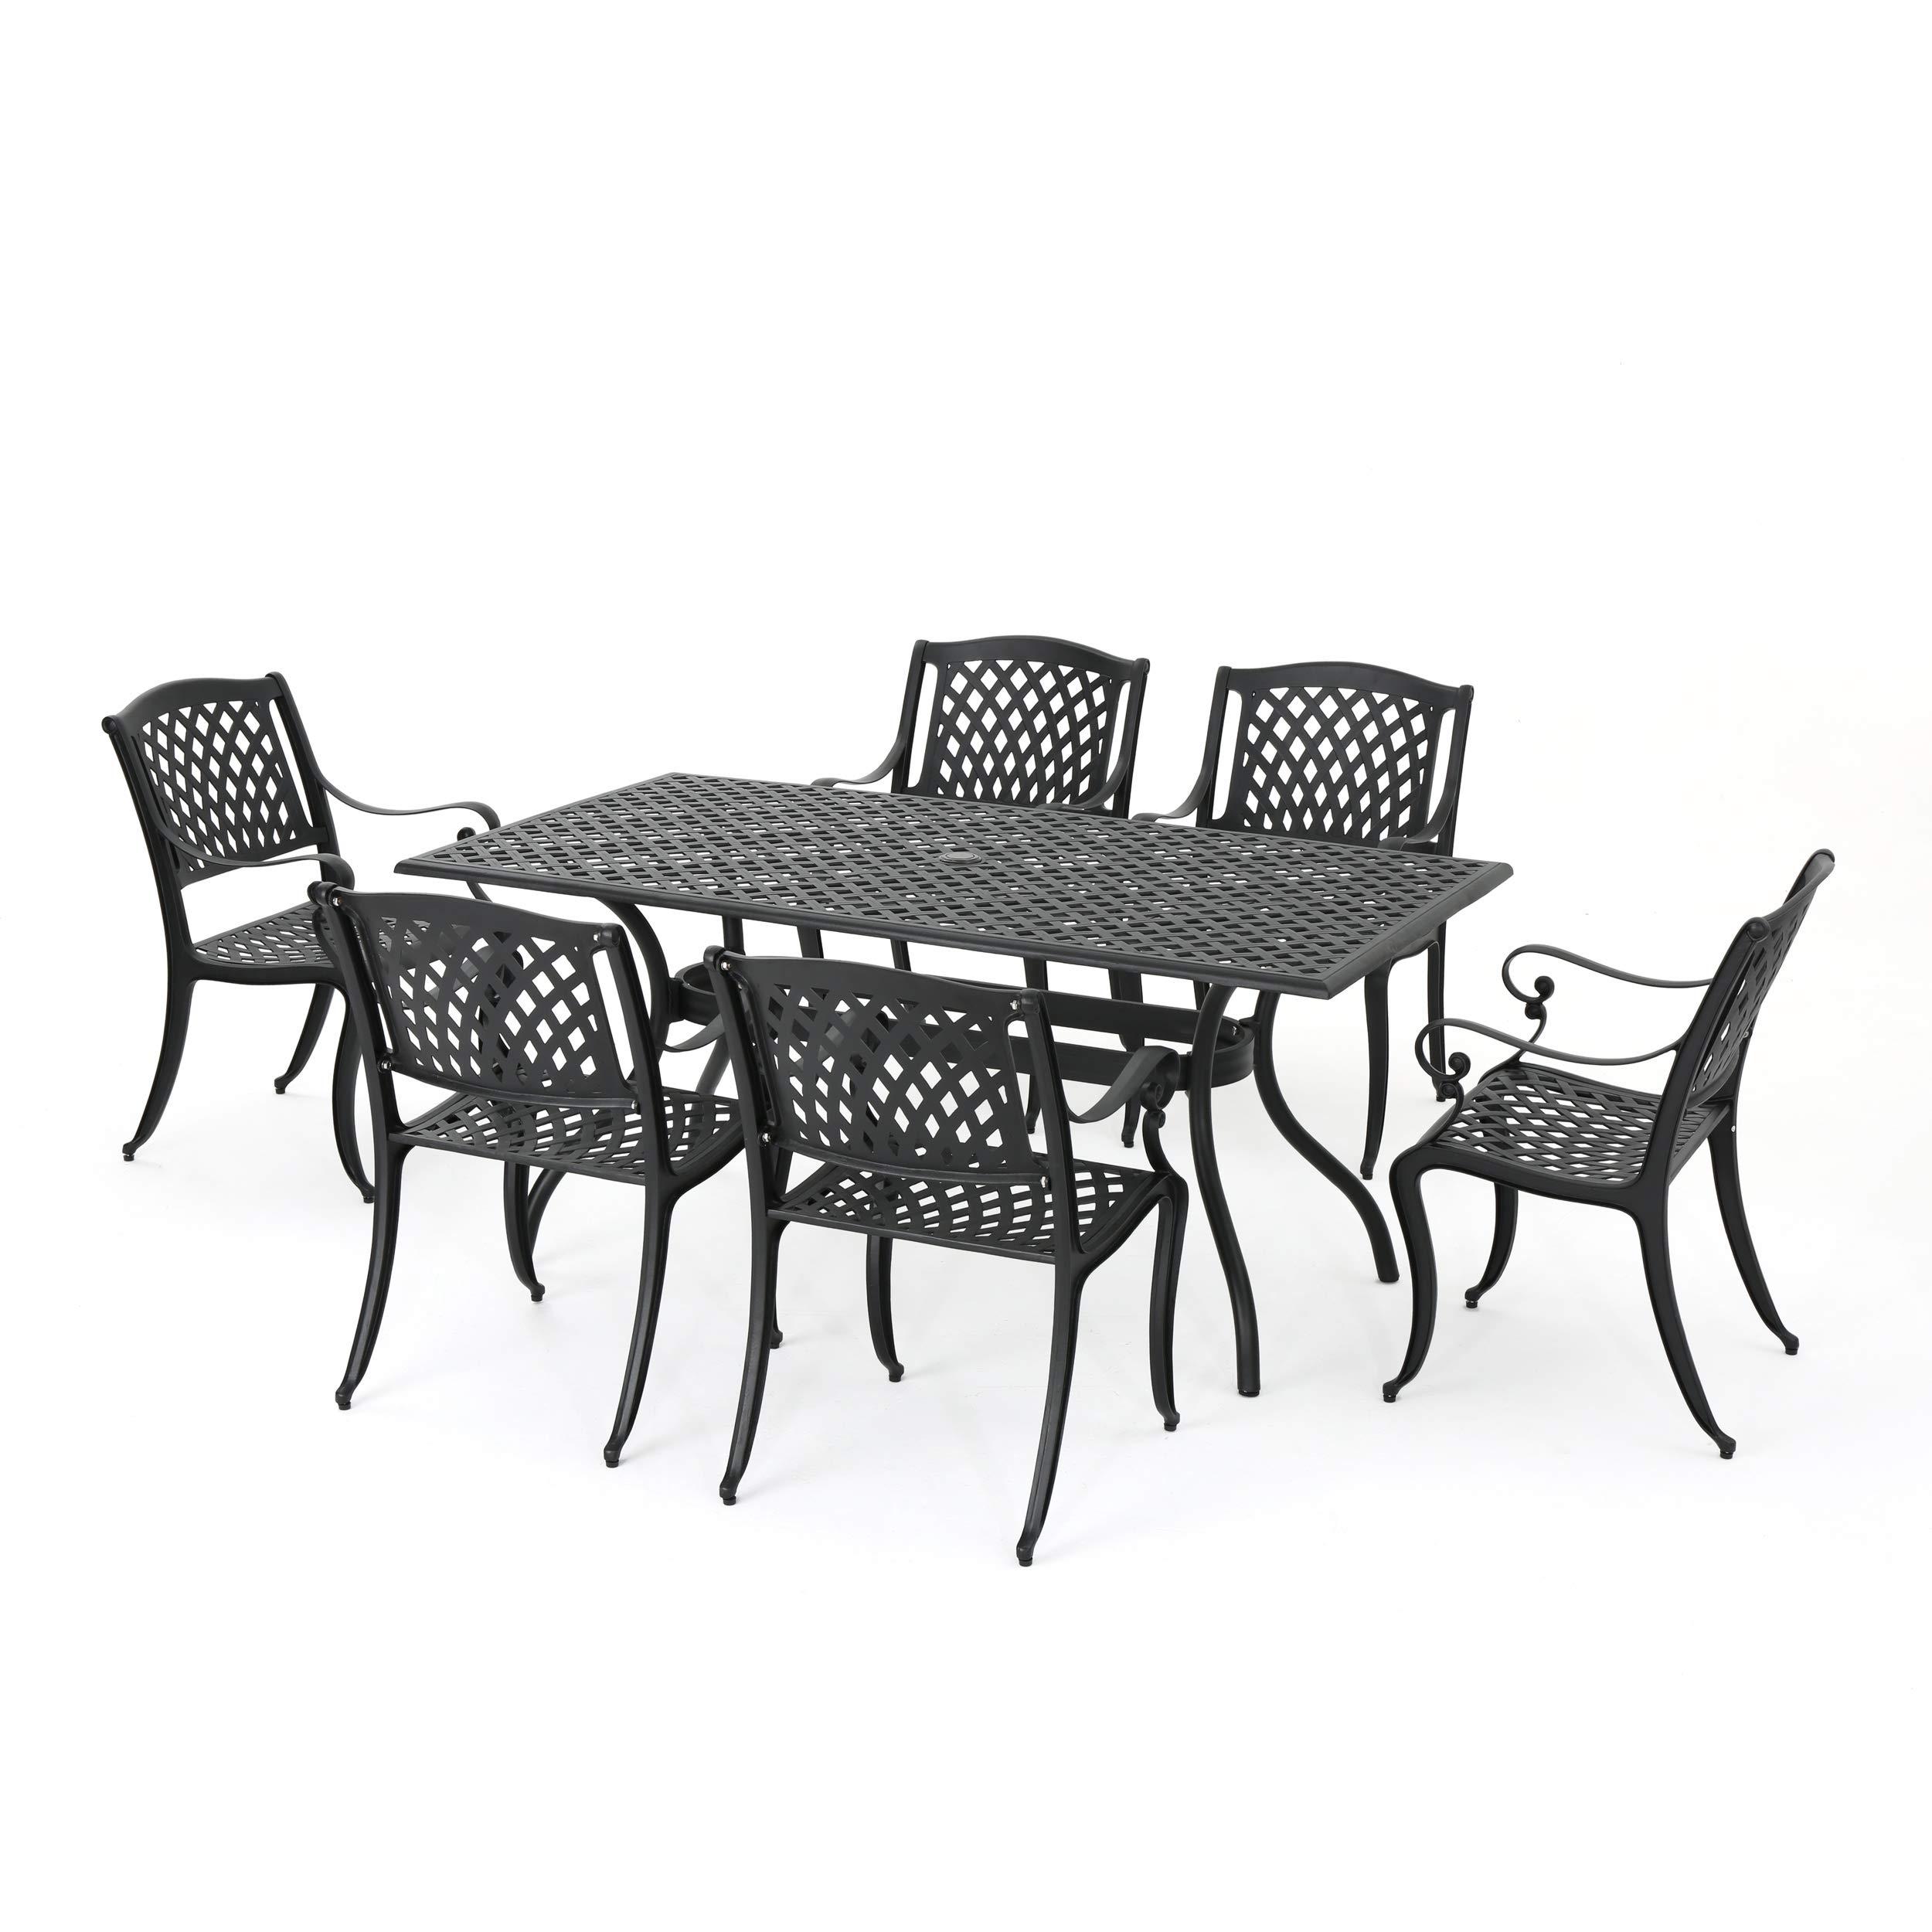 Great Deal Furniture 295848 Deal Furniture Marietta | 7 Piece Cast Aluminum Outdoor Dining S, Black